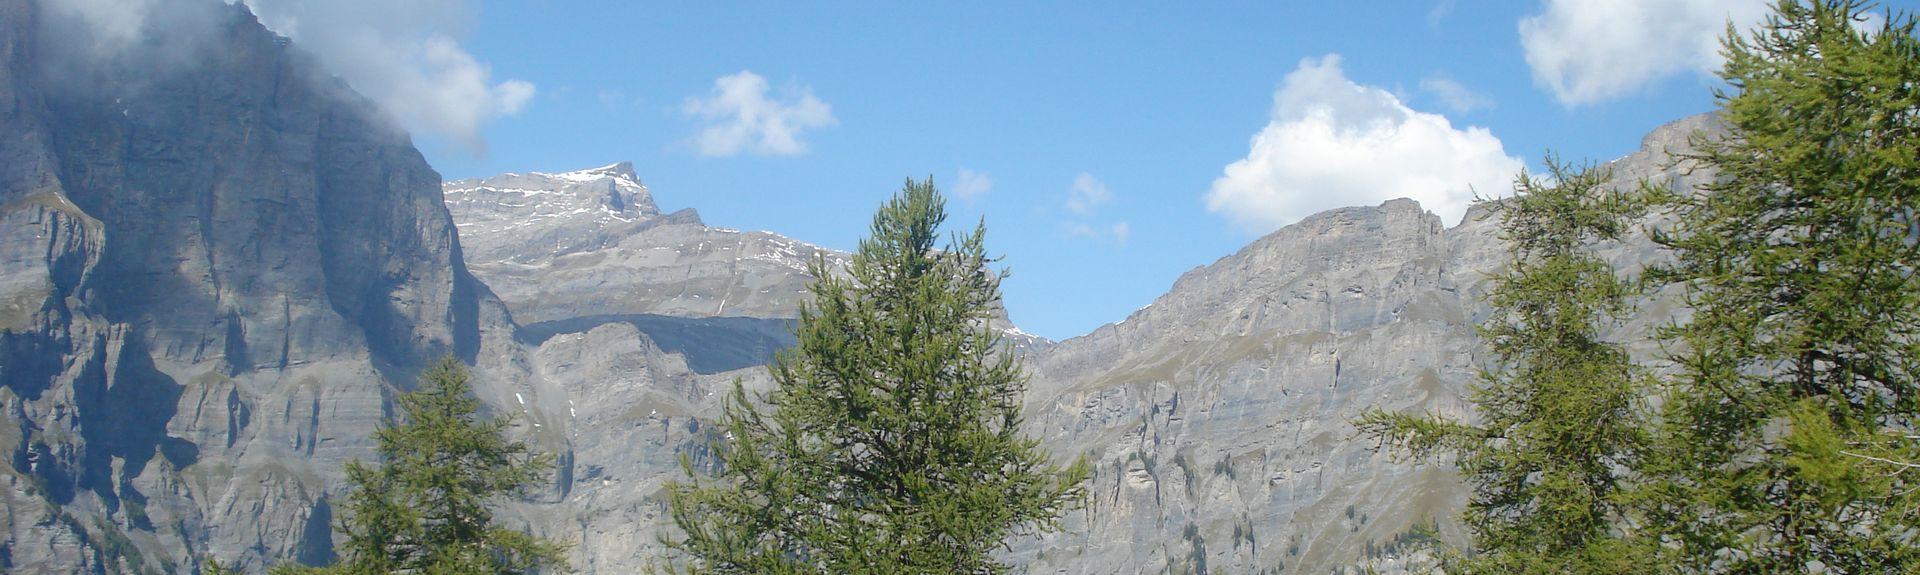 Chermignon, Valais, Switzerland